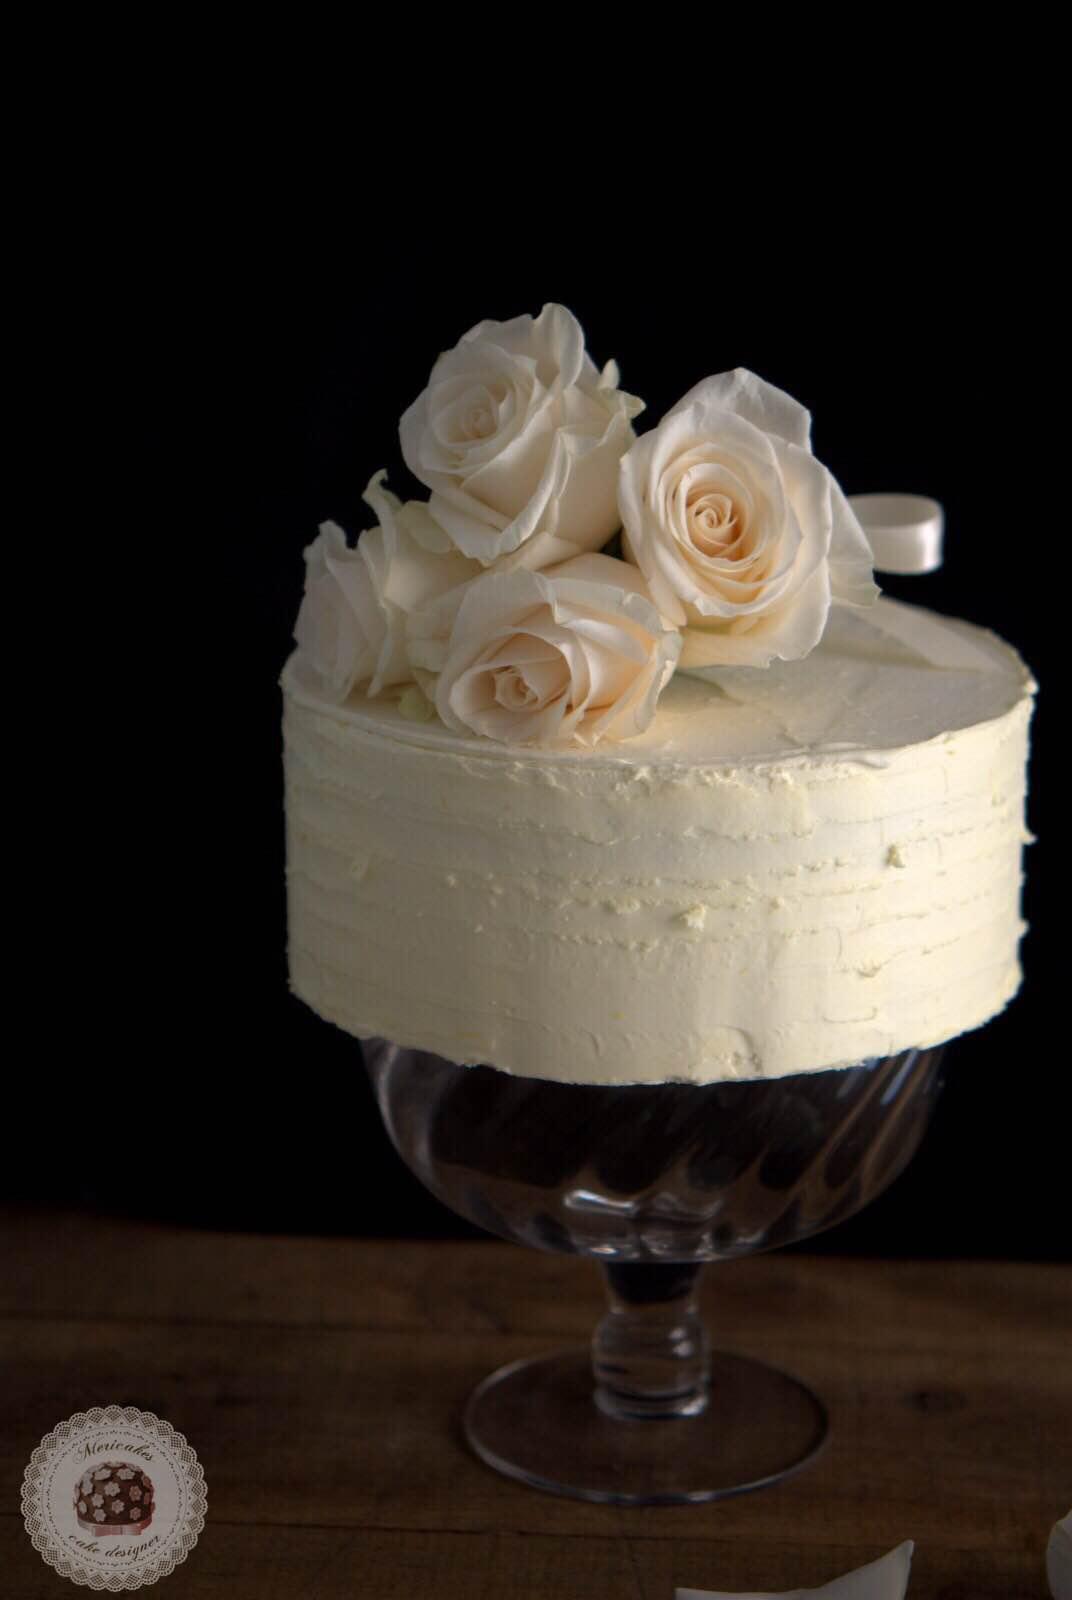 layer-cake-naked-cake-wedding-cake-bodas-barcelona-mericakes-tarta-de-boda-white-cake-roses-barcelona-wedding-2